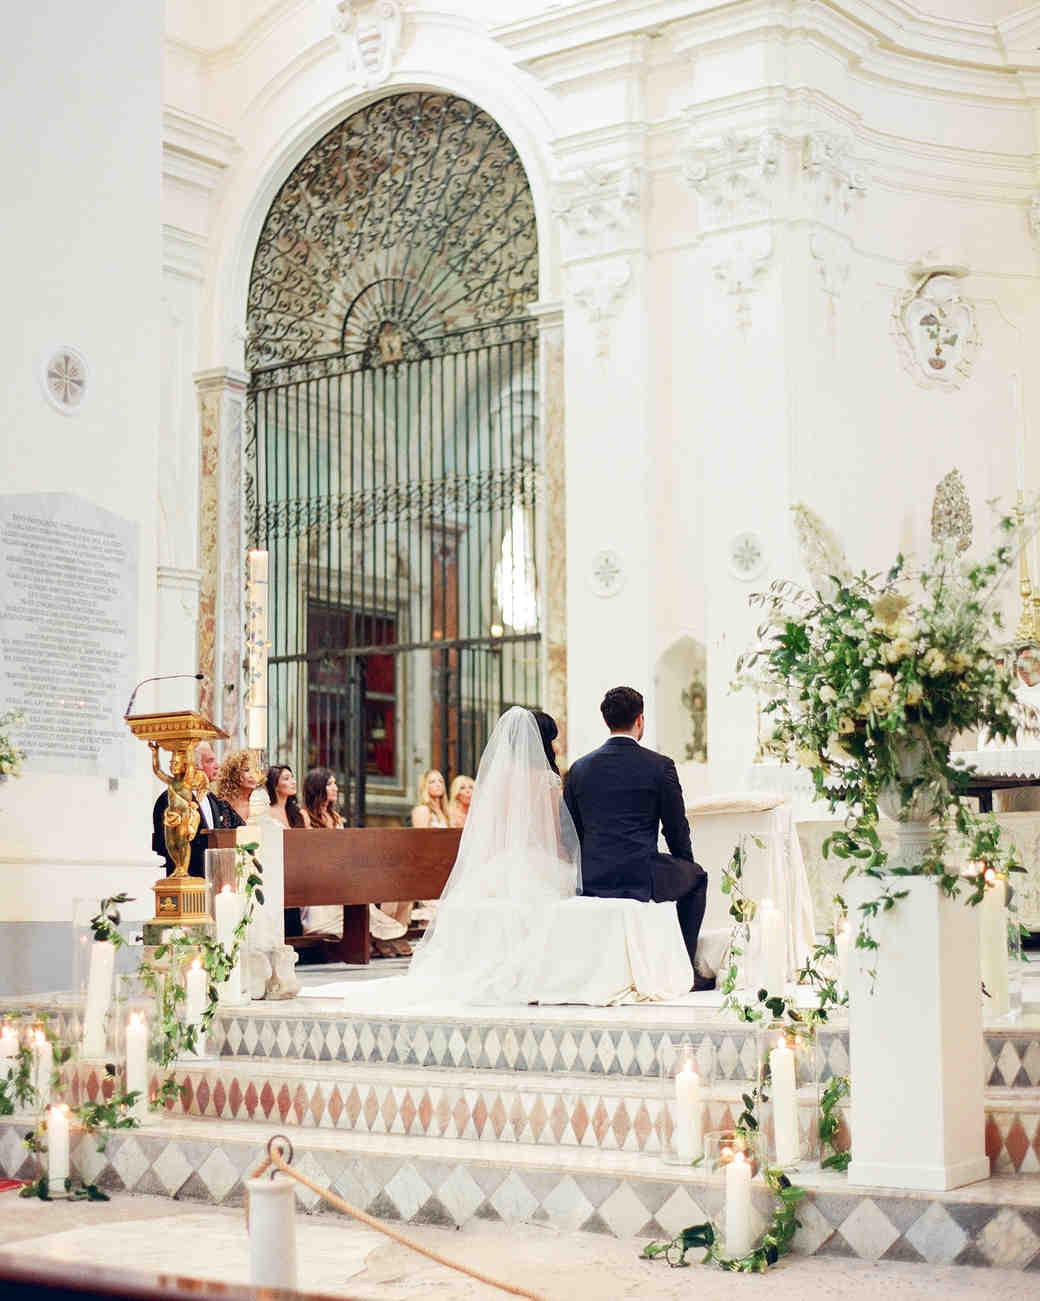 lisa-greg-italy-wedding-ceremony-103312968_vert.jpg